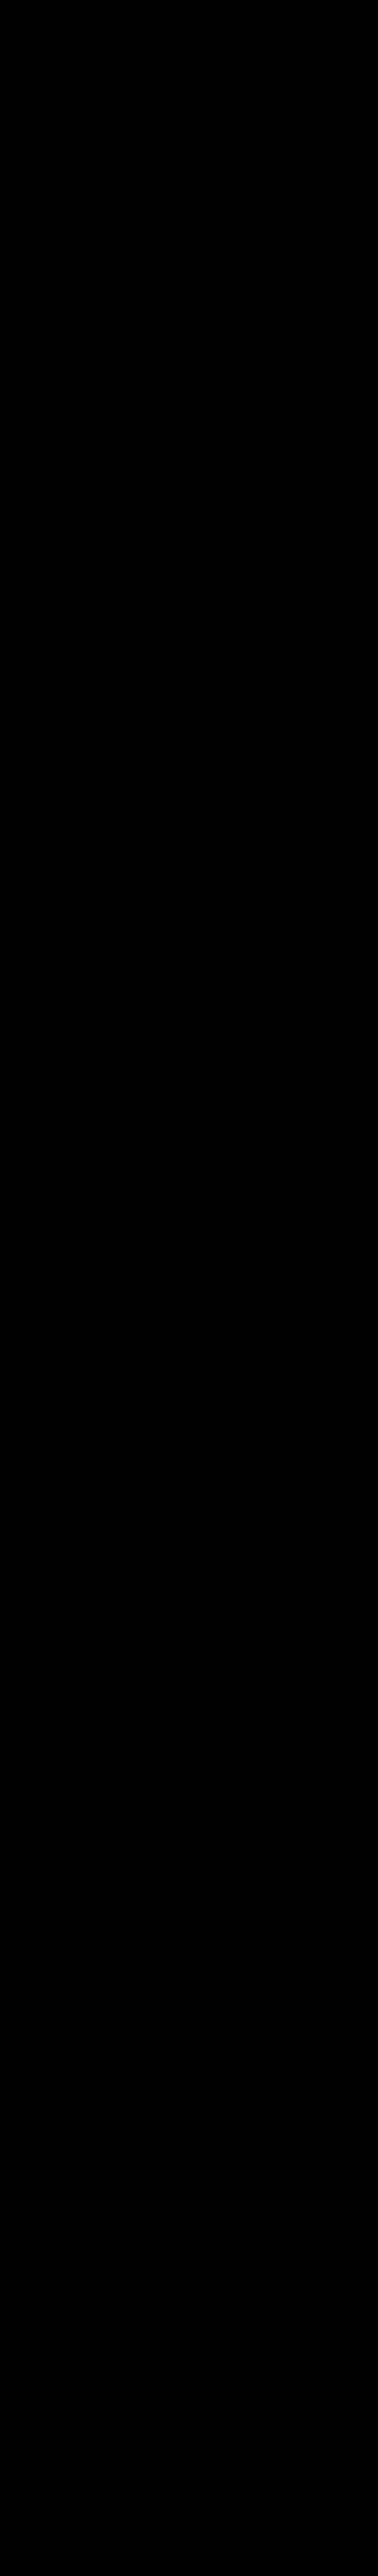 vector royalty free stock Public Domain Clip Art Image